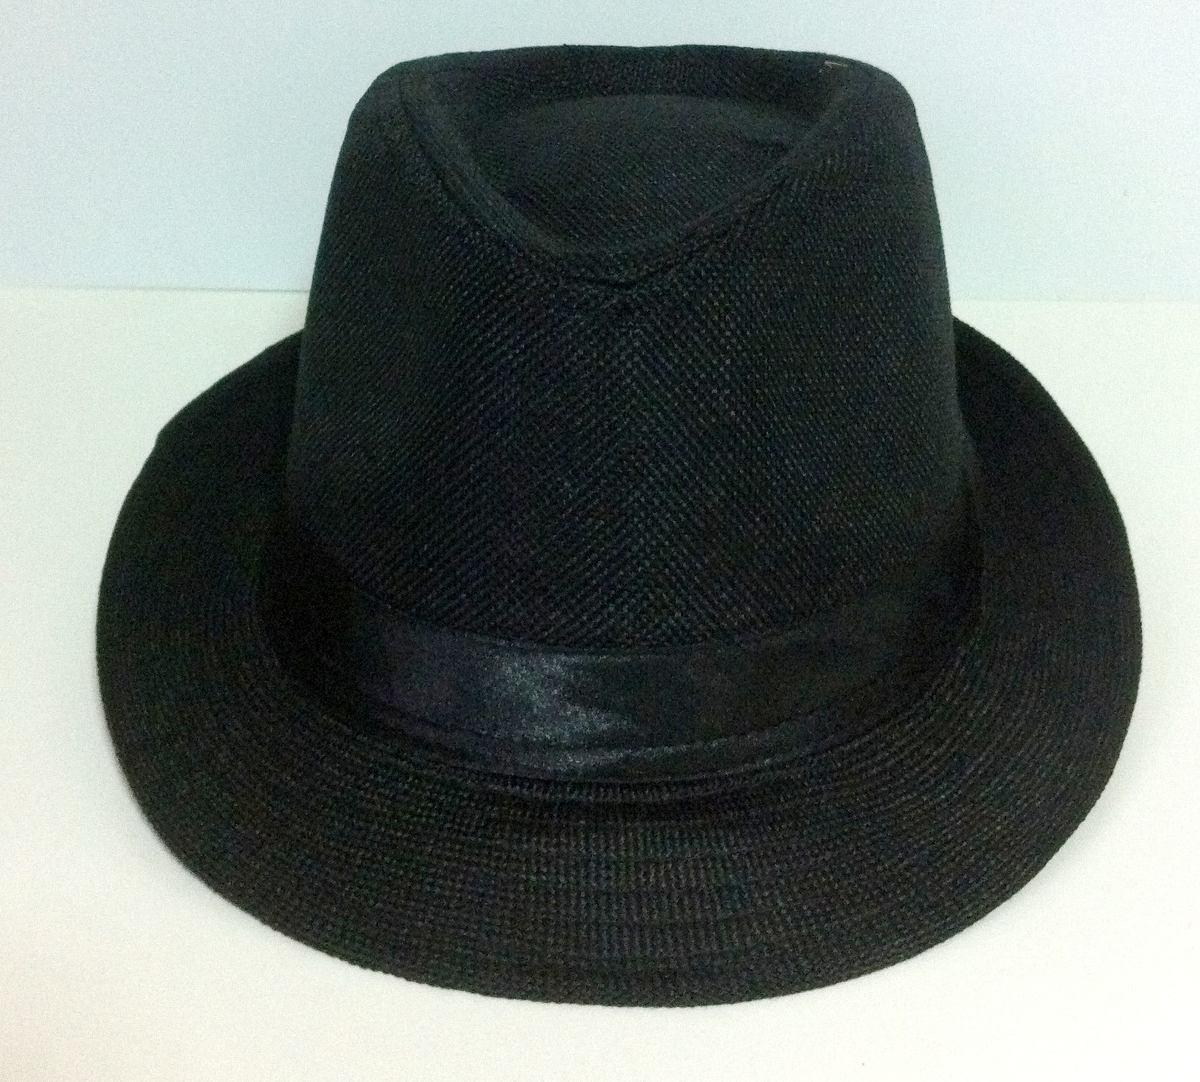 45f683c81f35a chapéu panamá estilo fedora aba curta modelável preto. Carregando zoom.